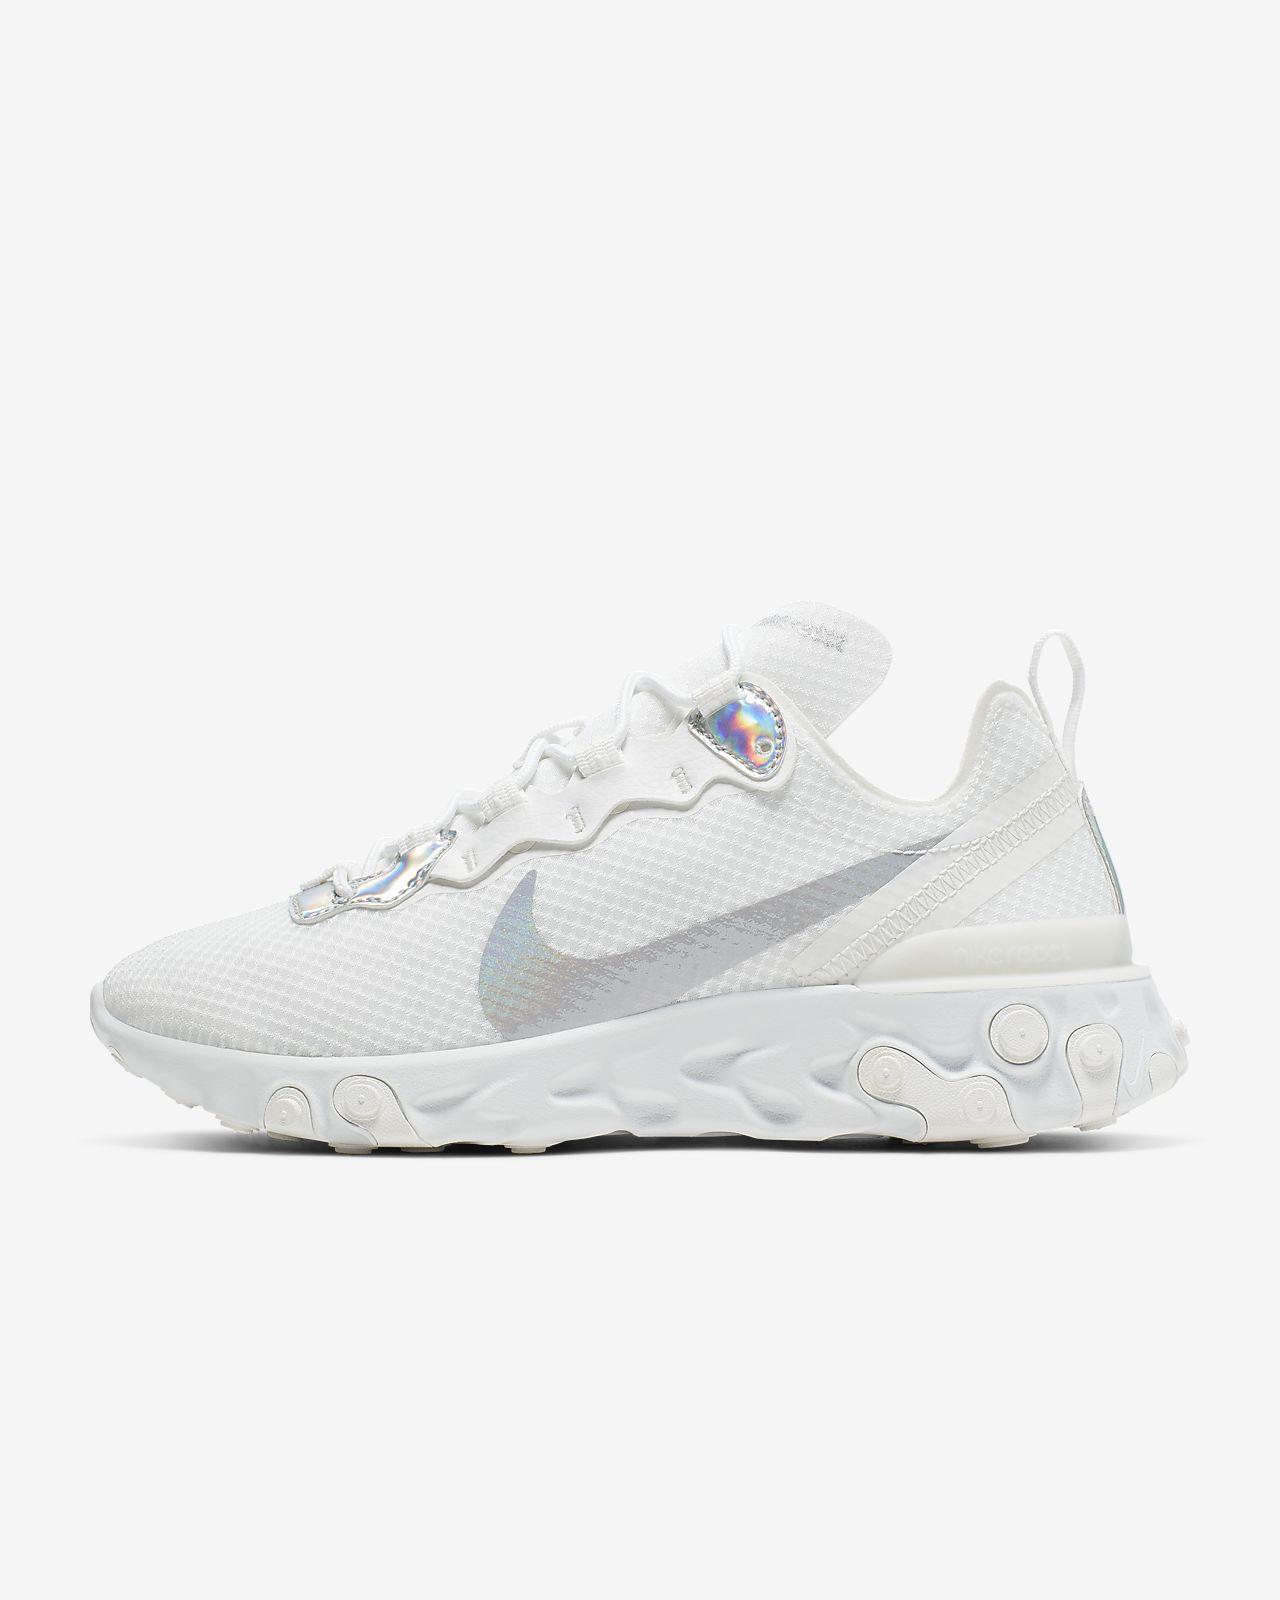 Calzado iridiscente para mujer Nike React Element 55